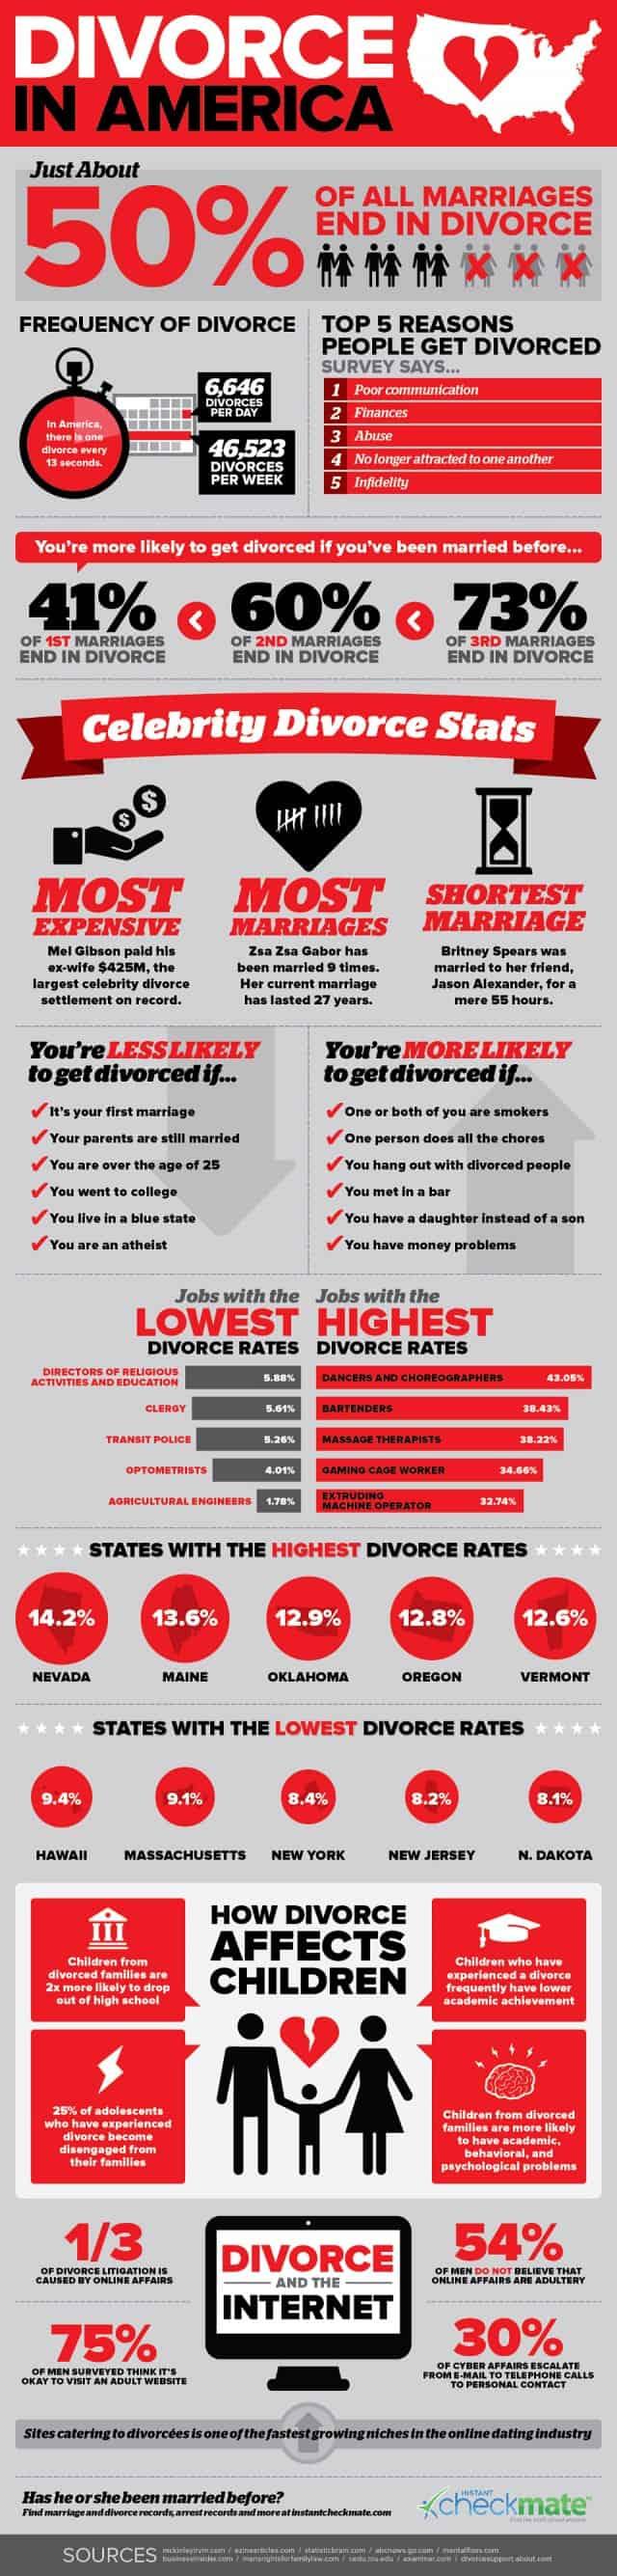 Divorce in America Infographic